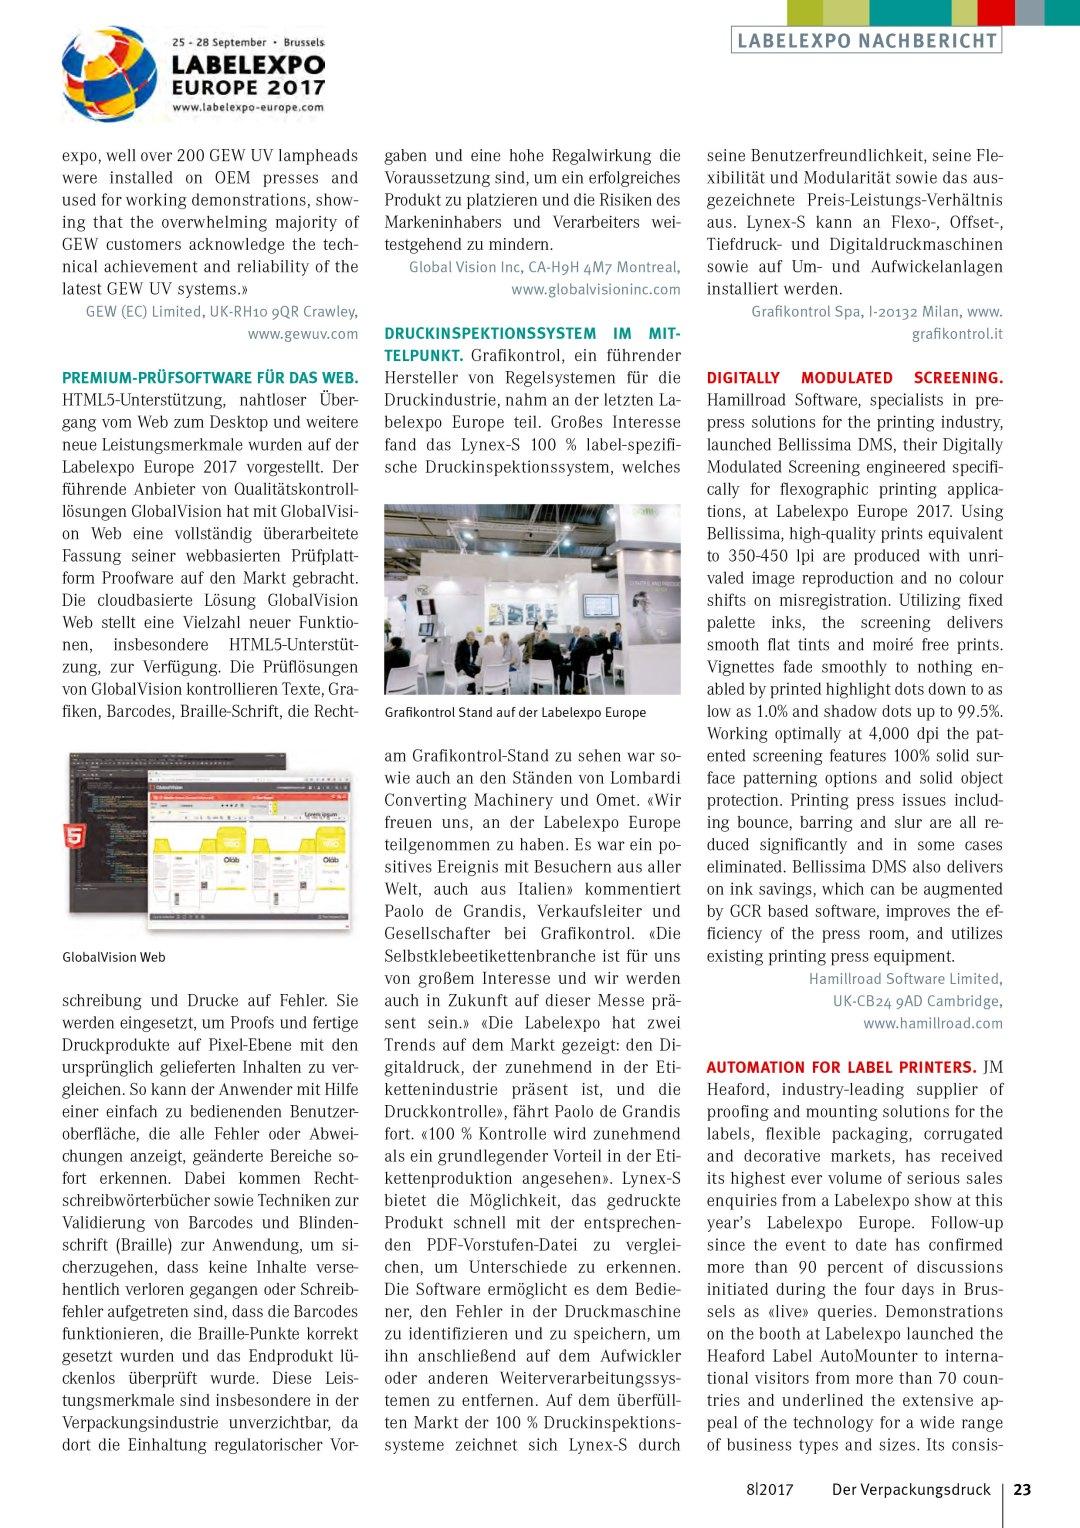 Der Verpackungsdruck Magazine for packaging printing - Label Expo Screening Bellissima